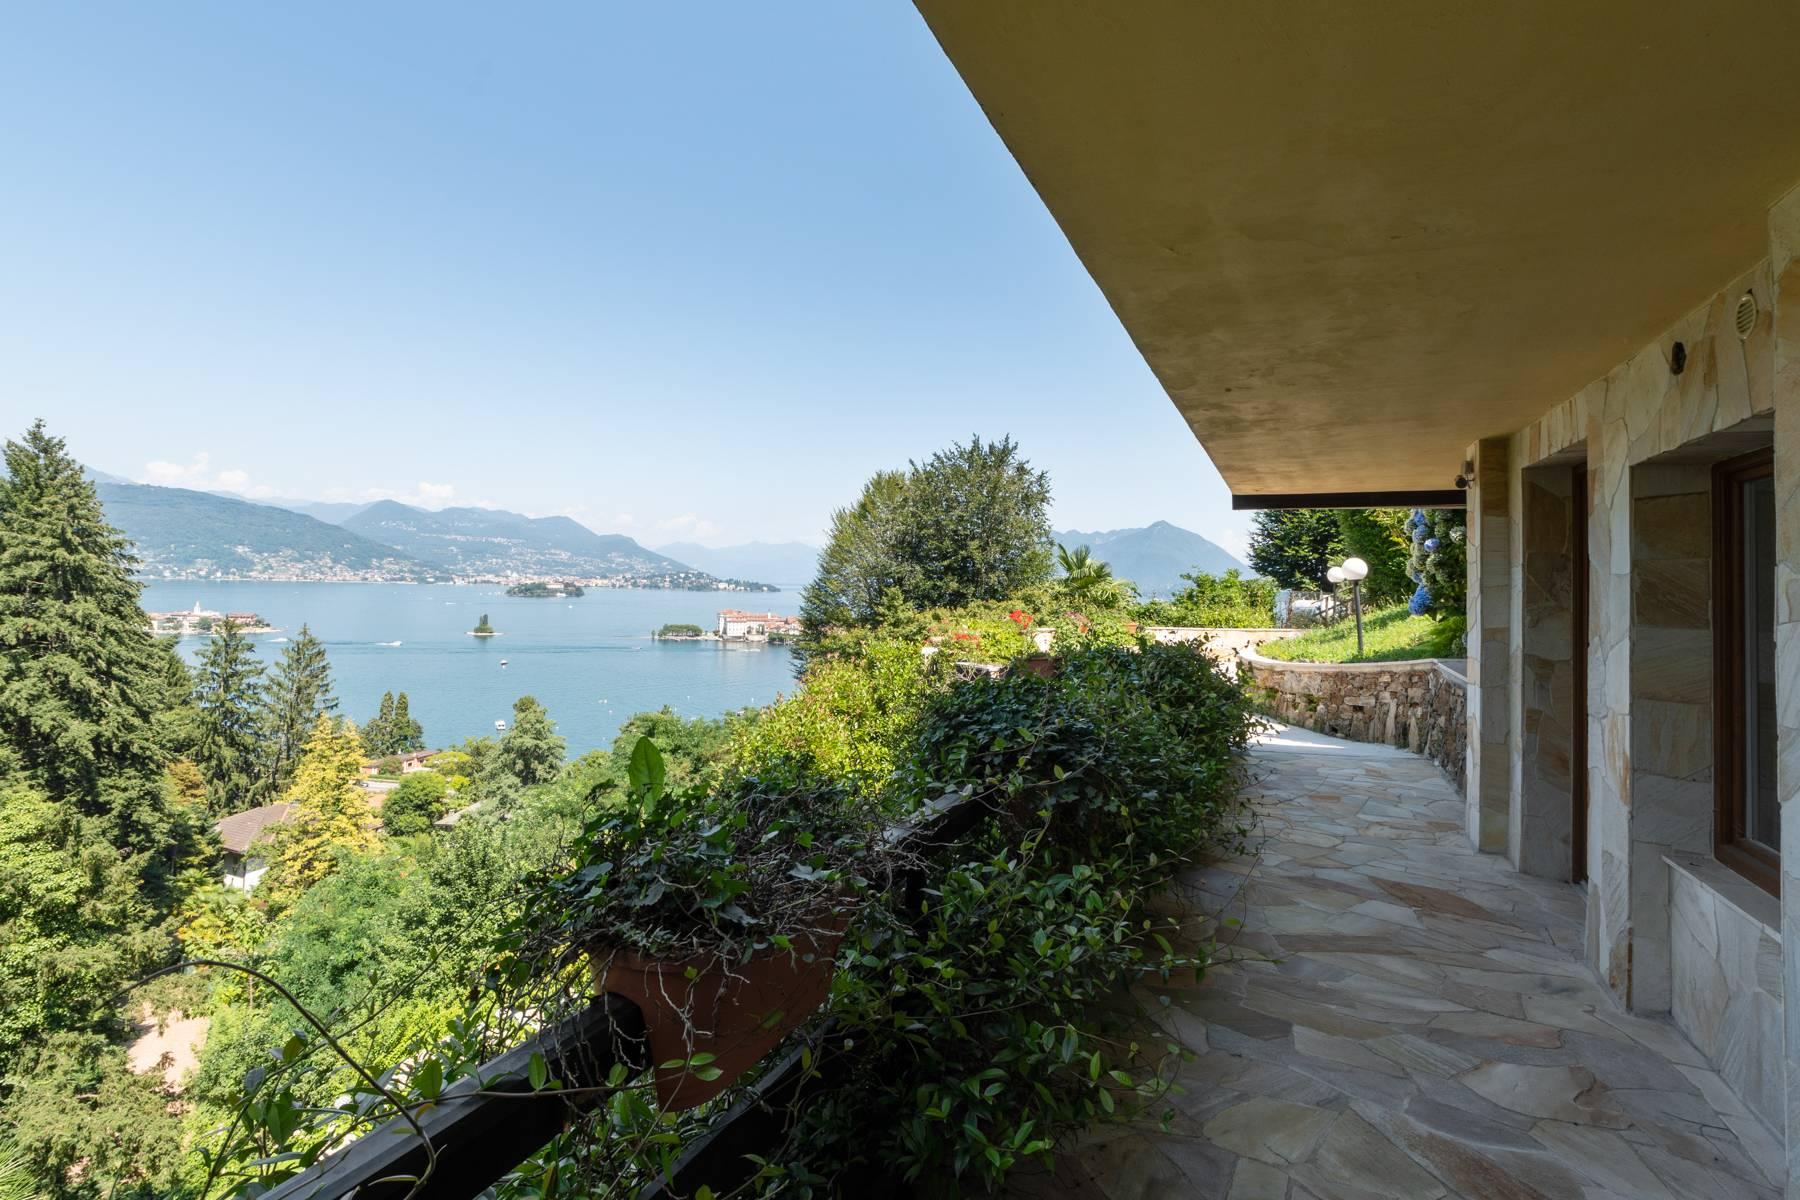 Villa in Vendita a Stresa: 5 locali, 364 mq - Foto 6